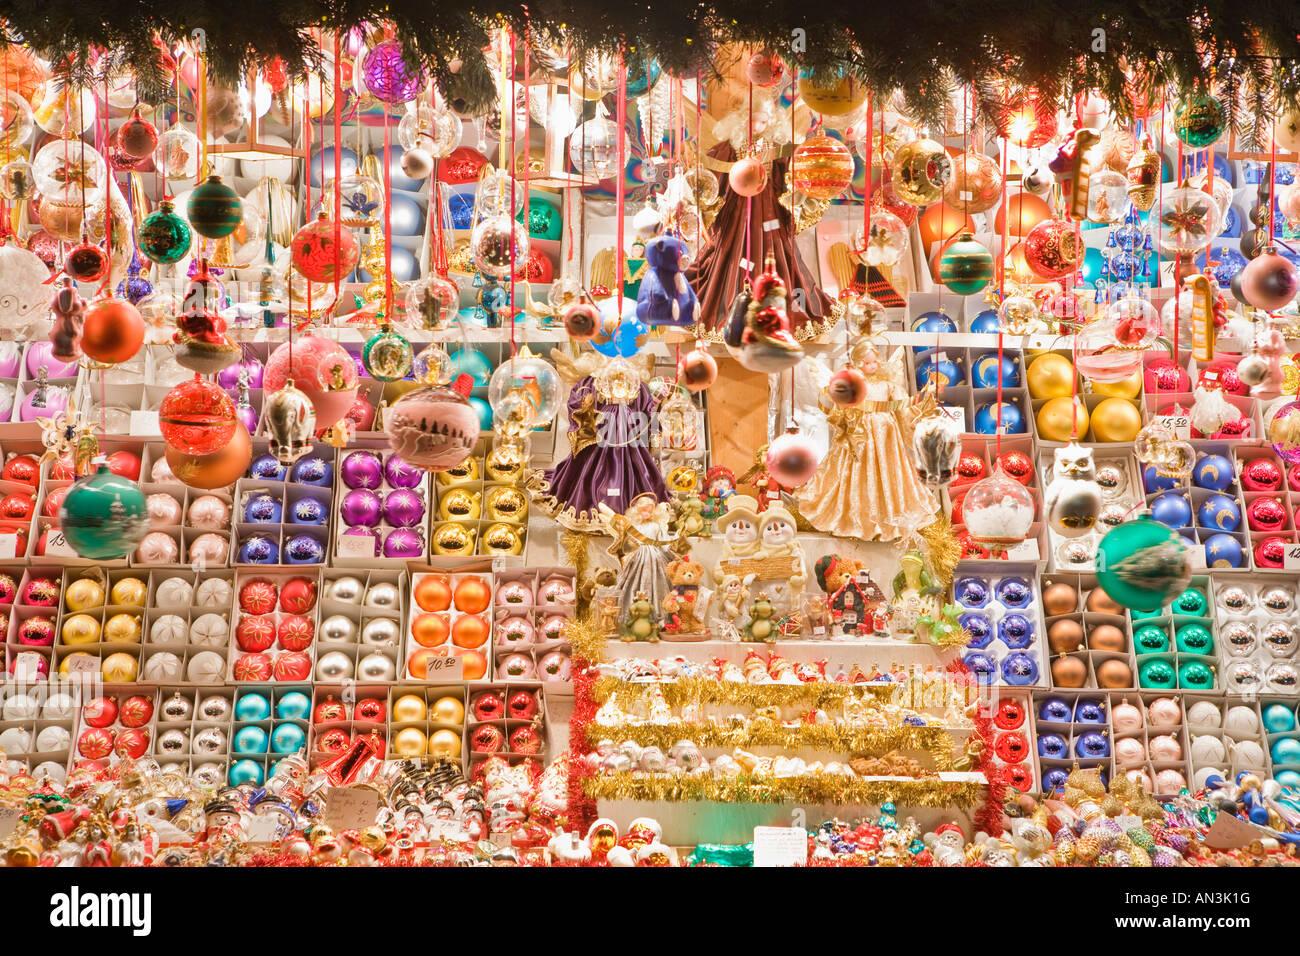 Germany Bavaria NÜrnberg The Christmas Market Christmas Ornaments Store